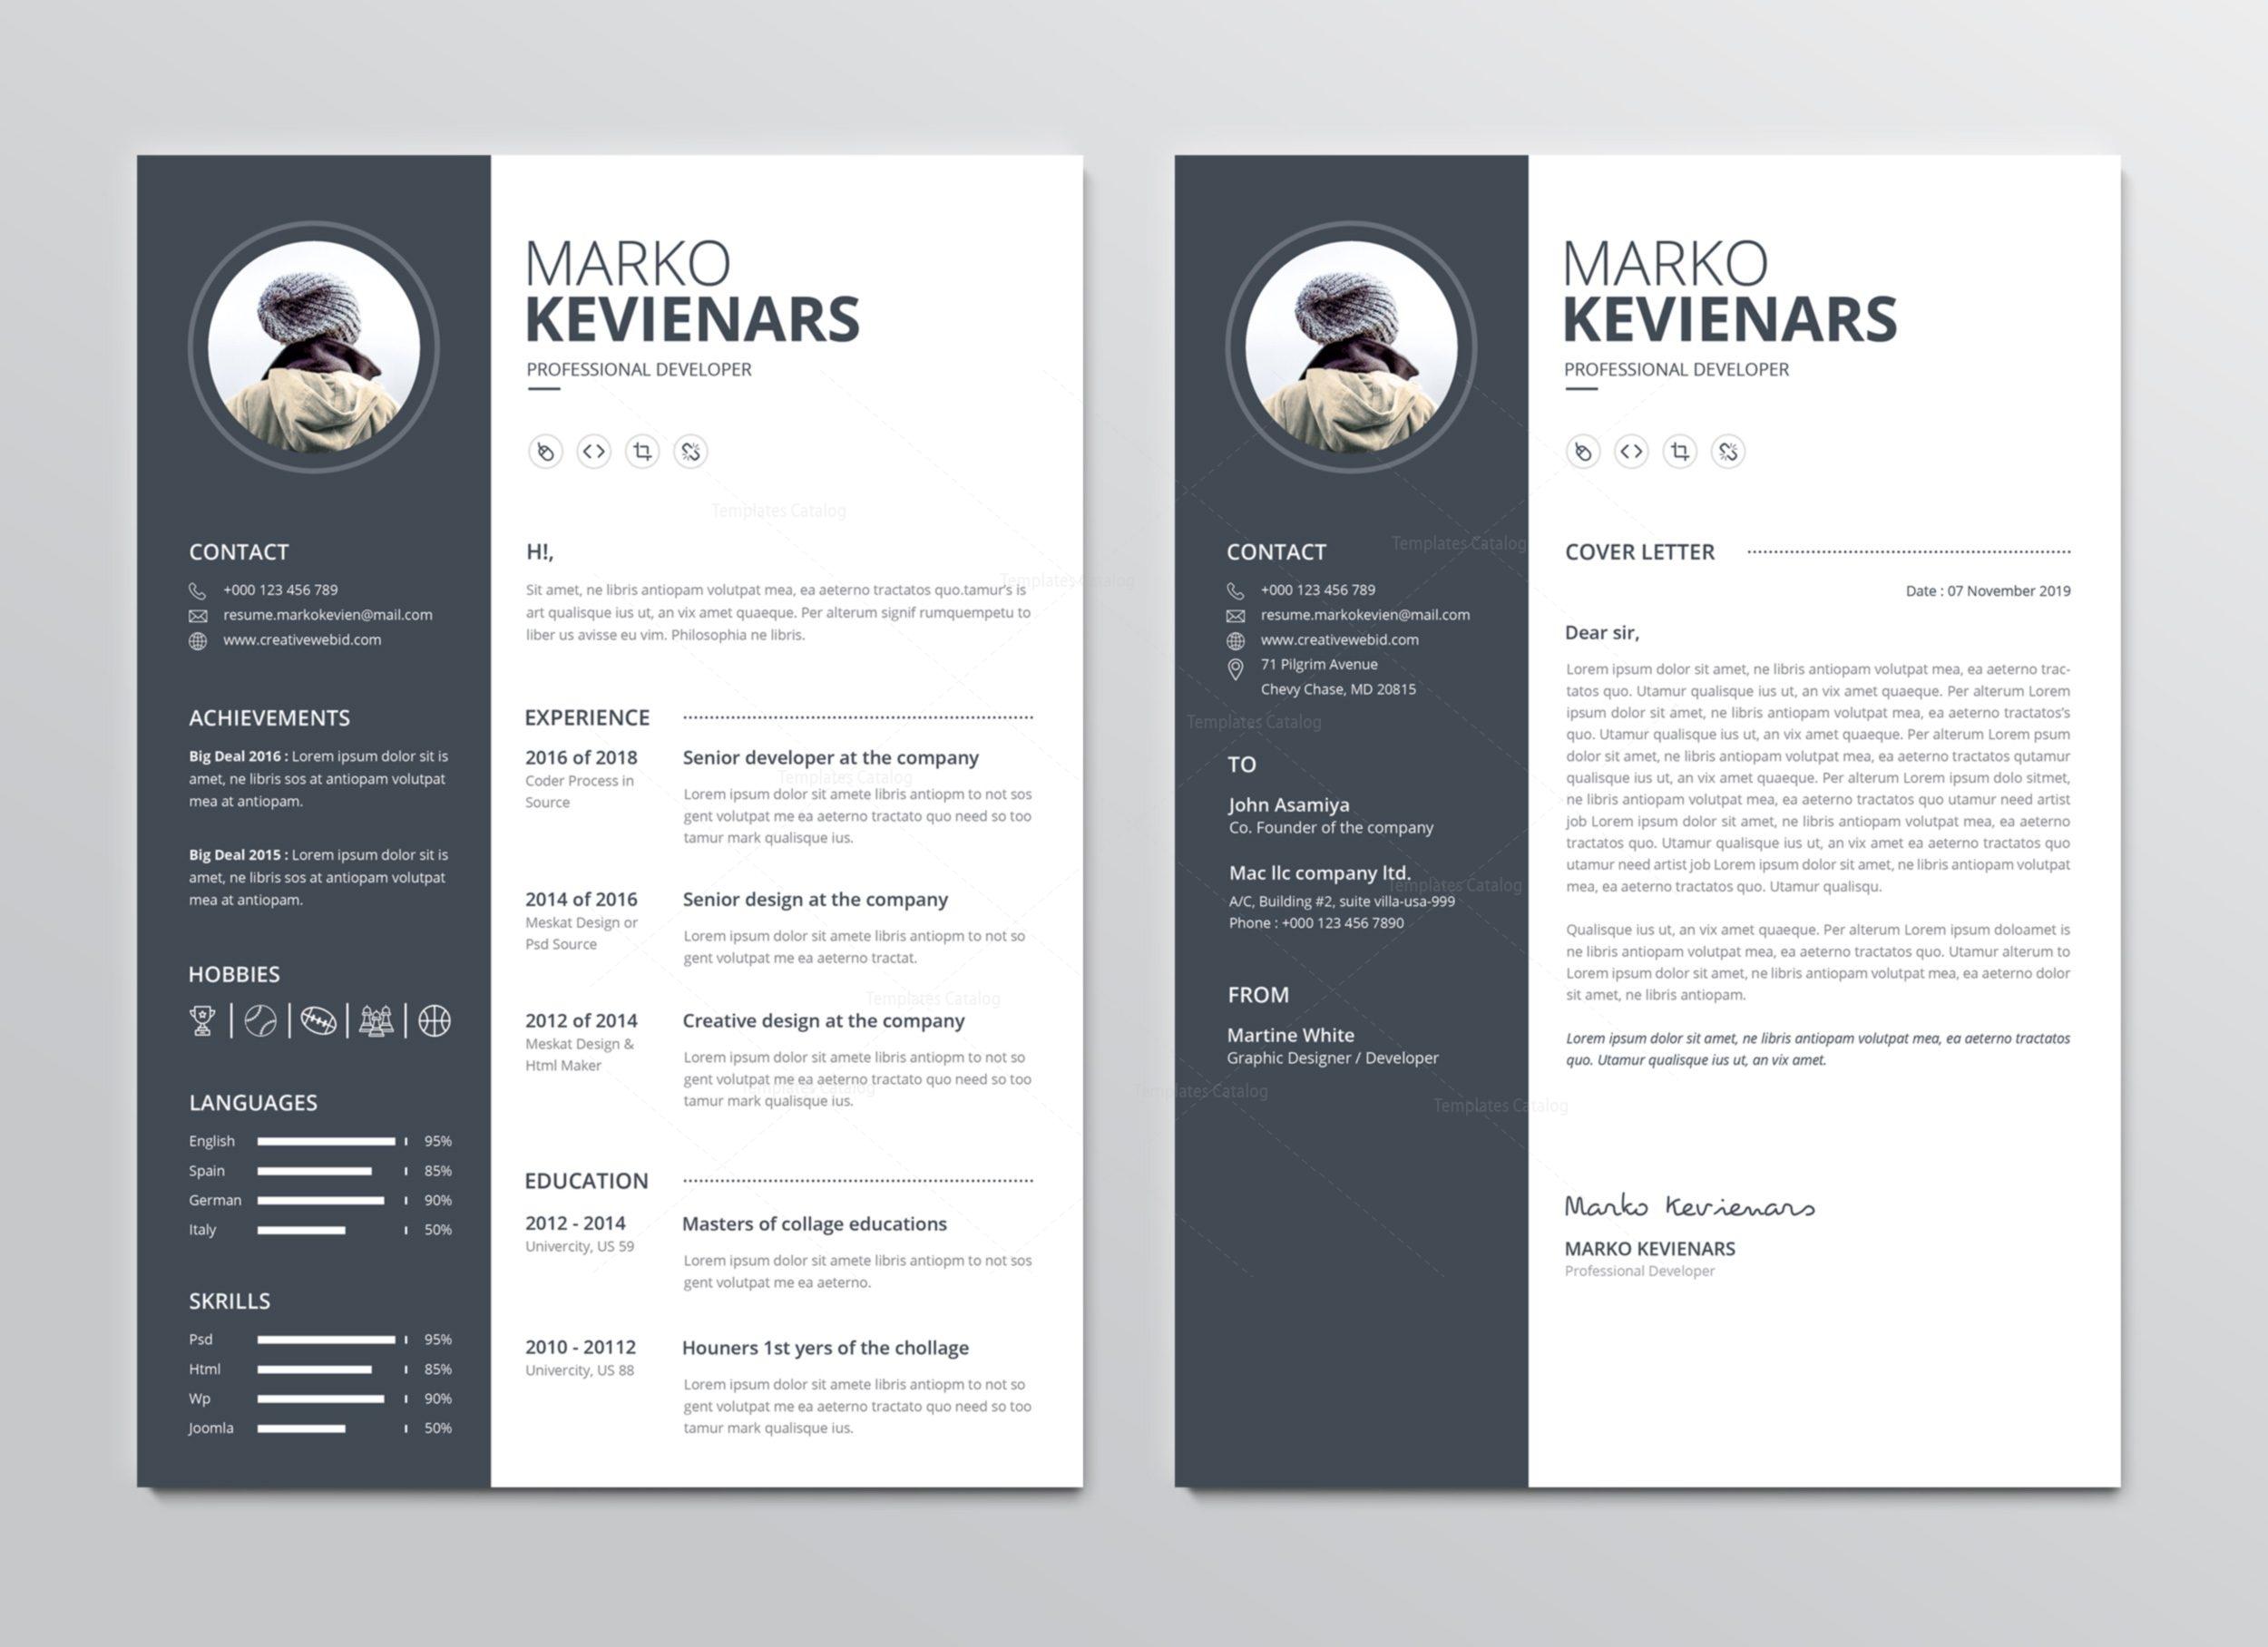 premium resume - Romeo.landinez.co